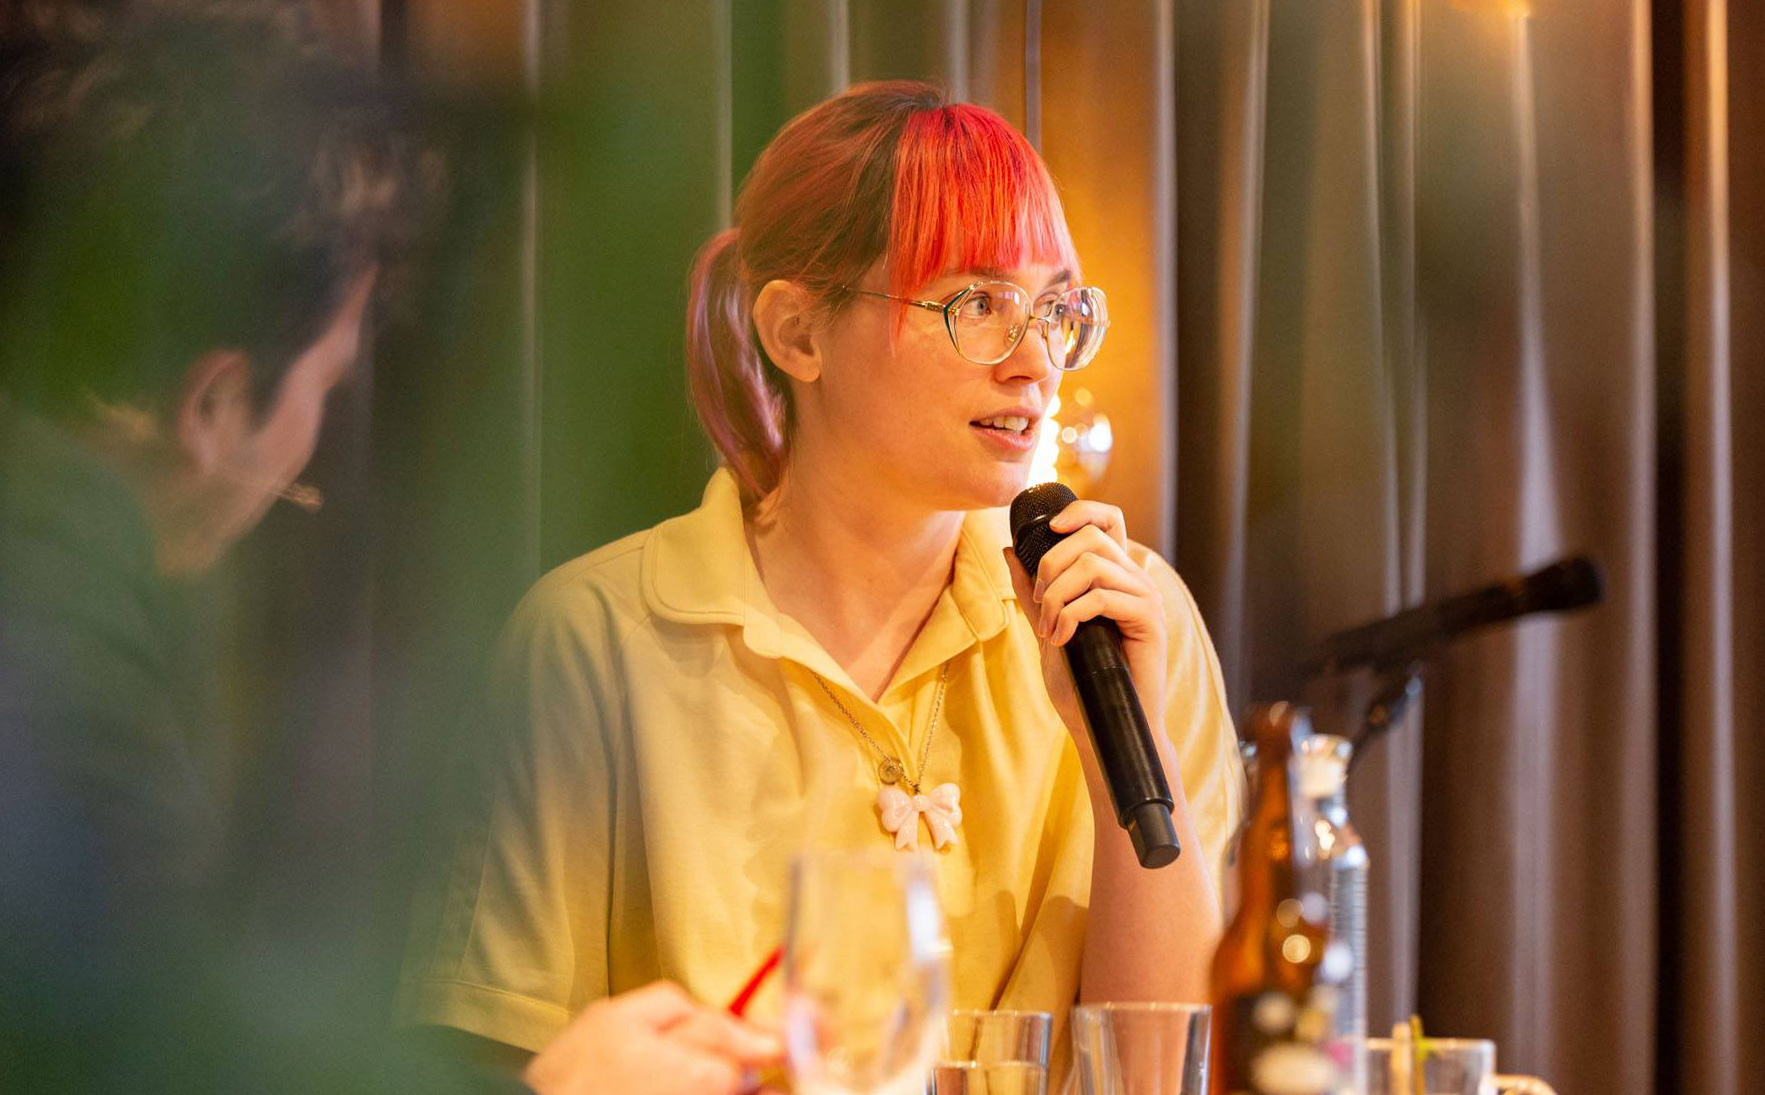 Bianca Toeps over autisme in talkshow Zzzzondag